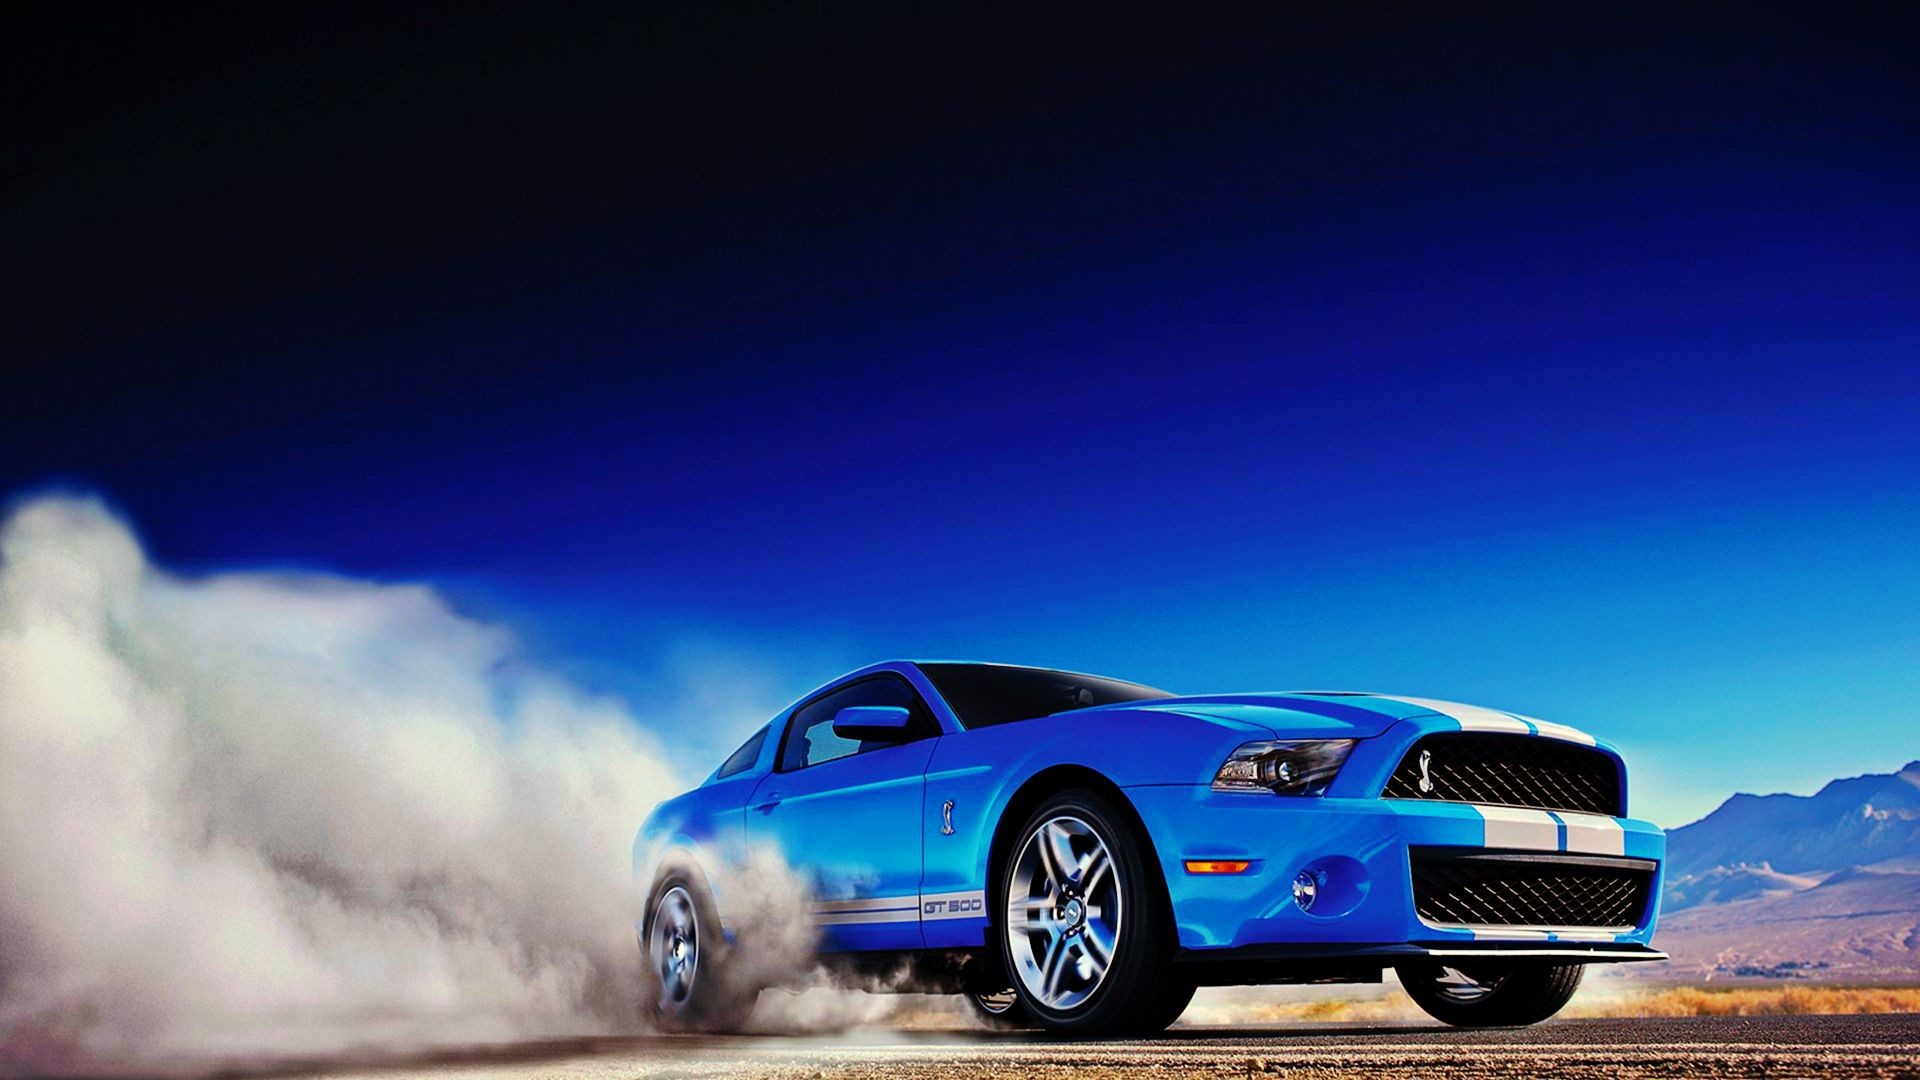 blue sports car wallpaper